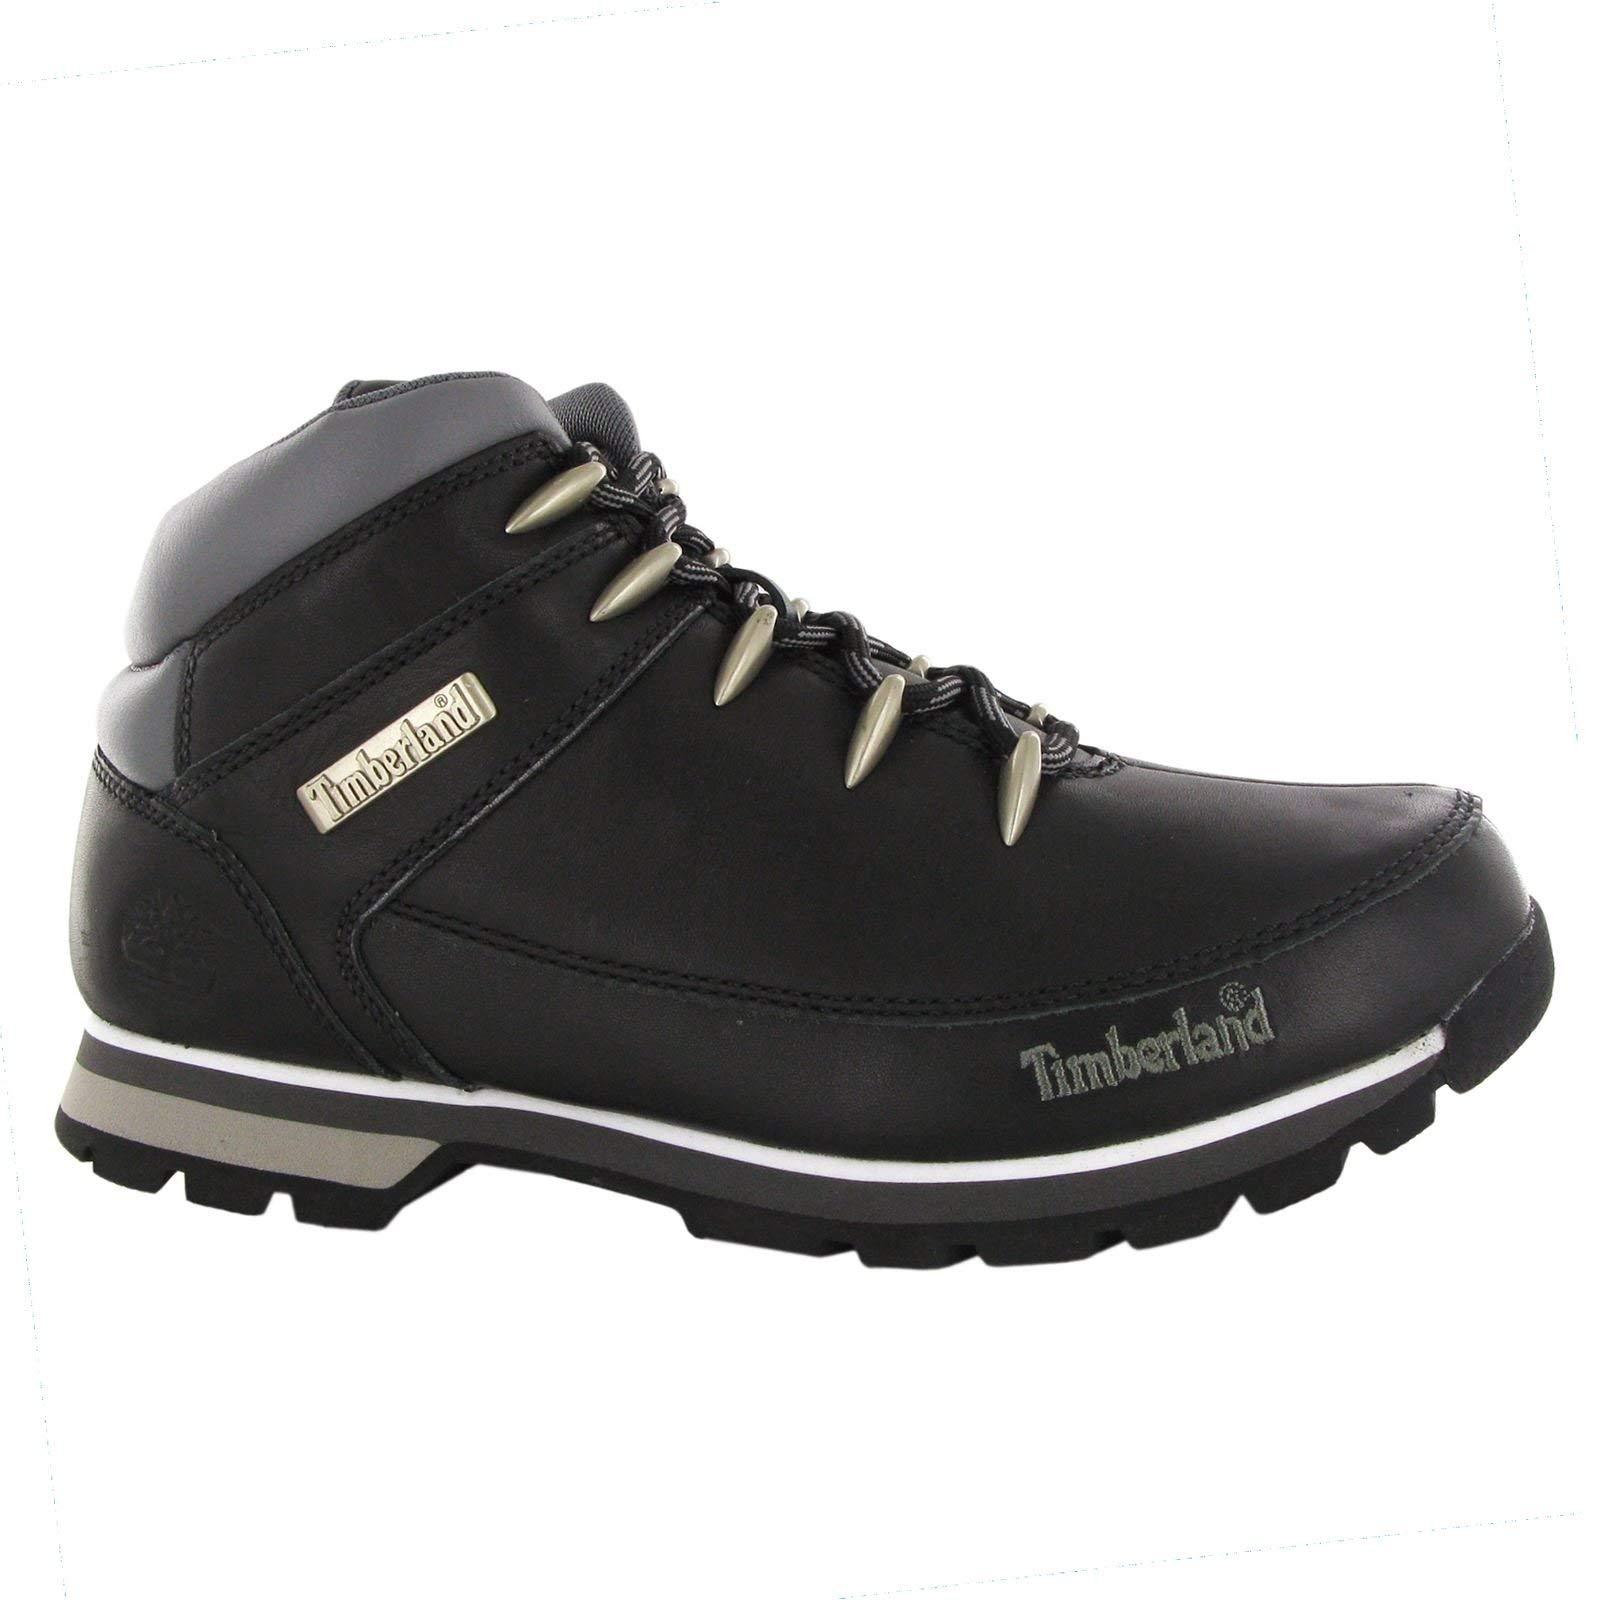 22caa0fb3d333 Timberland Euro Sprint Hiker